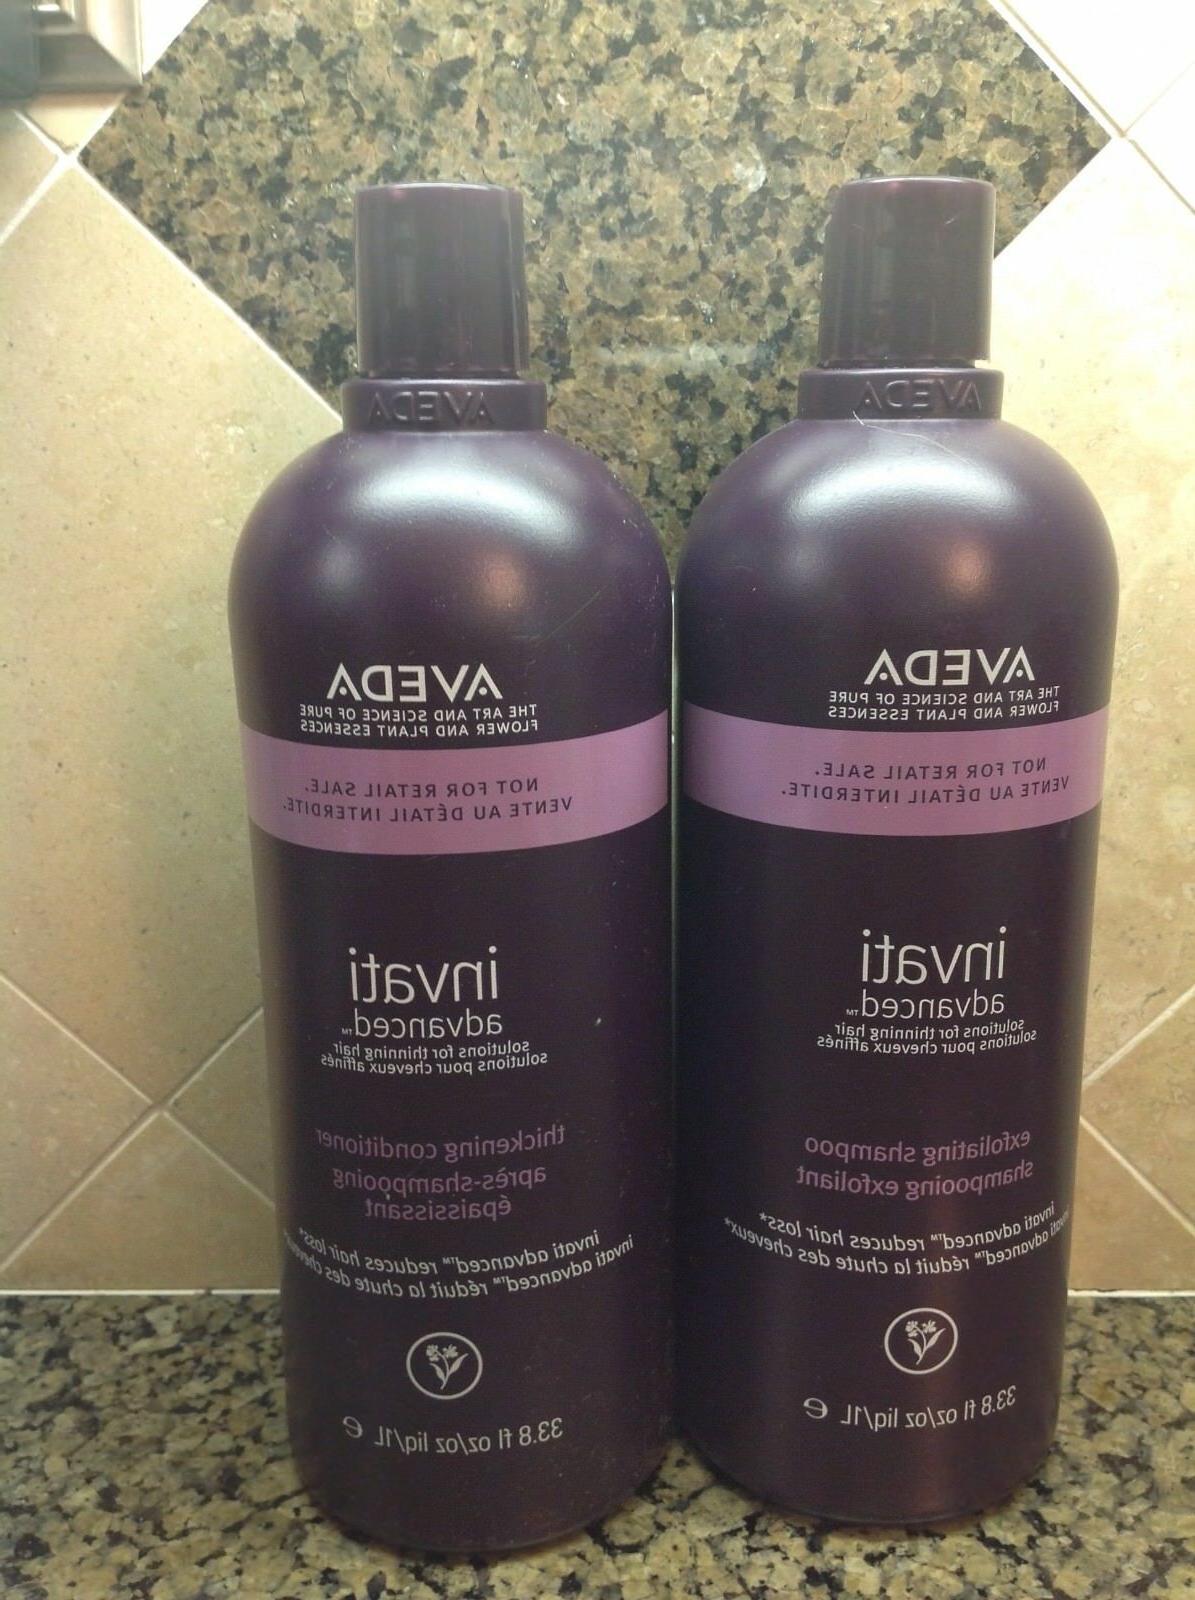 Aveda Invati Advanced Exfoliating Shampoo and Thickening Con